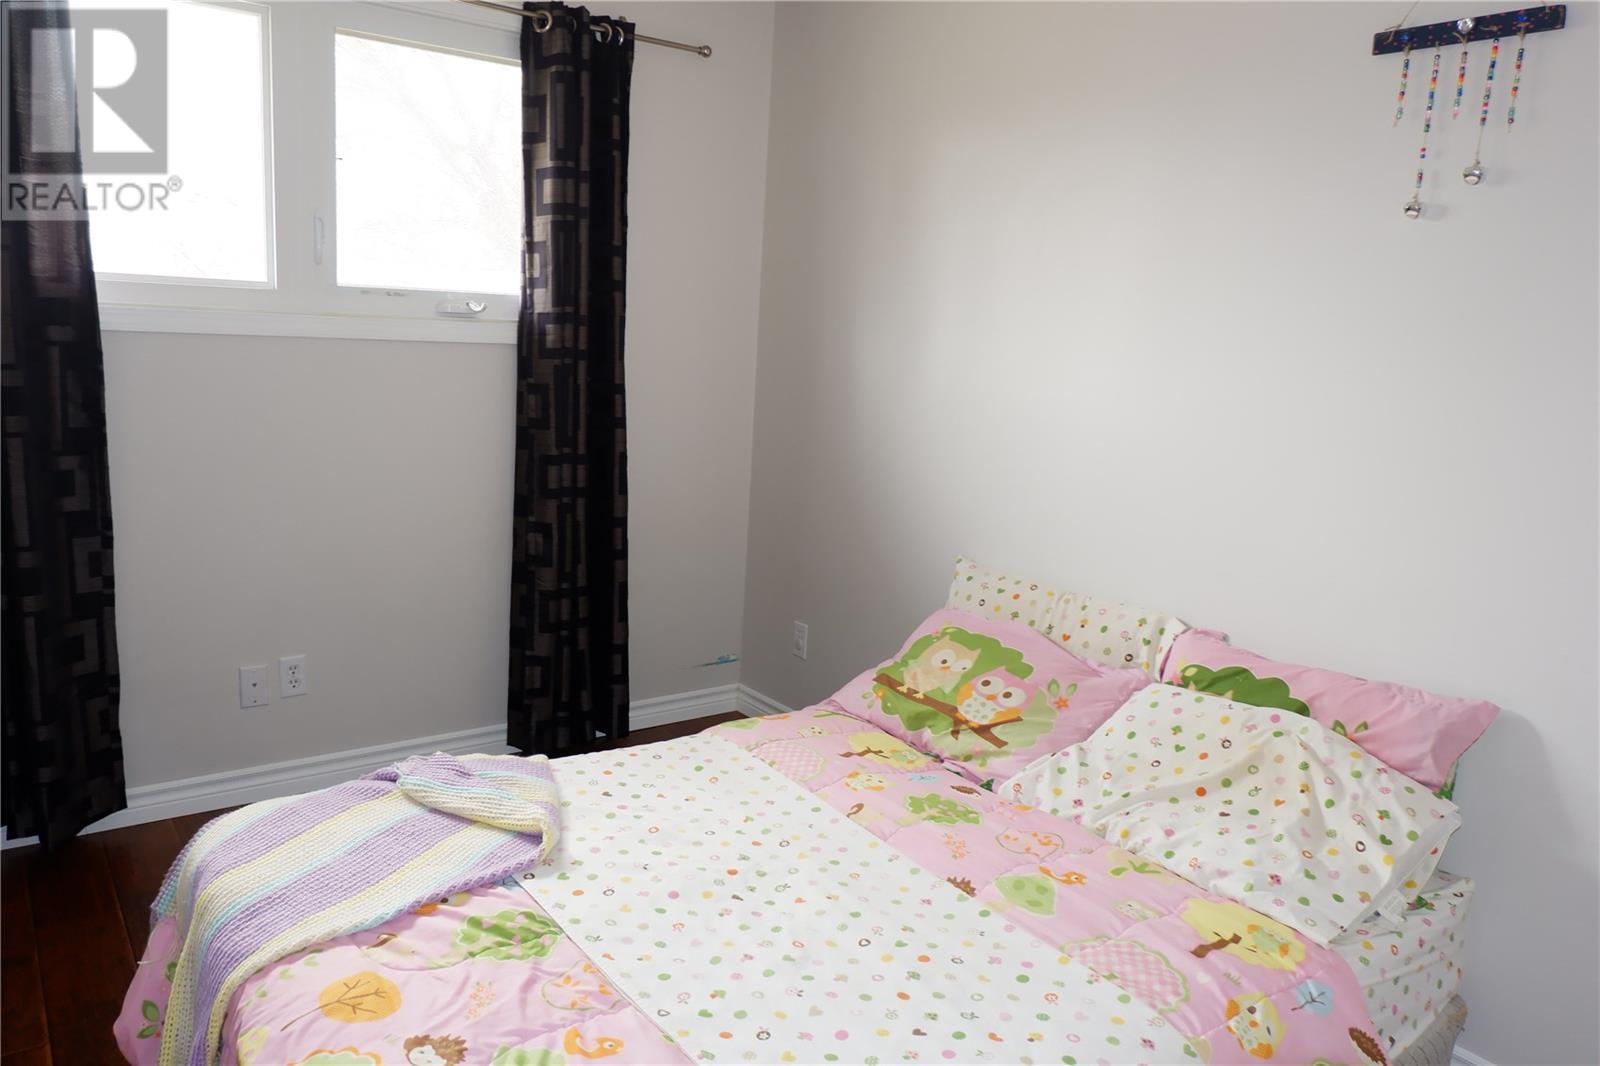 224 Crawford Ave W, Coronach, Saskatchewan  S0H 0Z0 - Photo 15 - SK805942